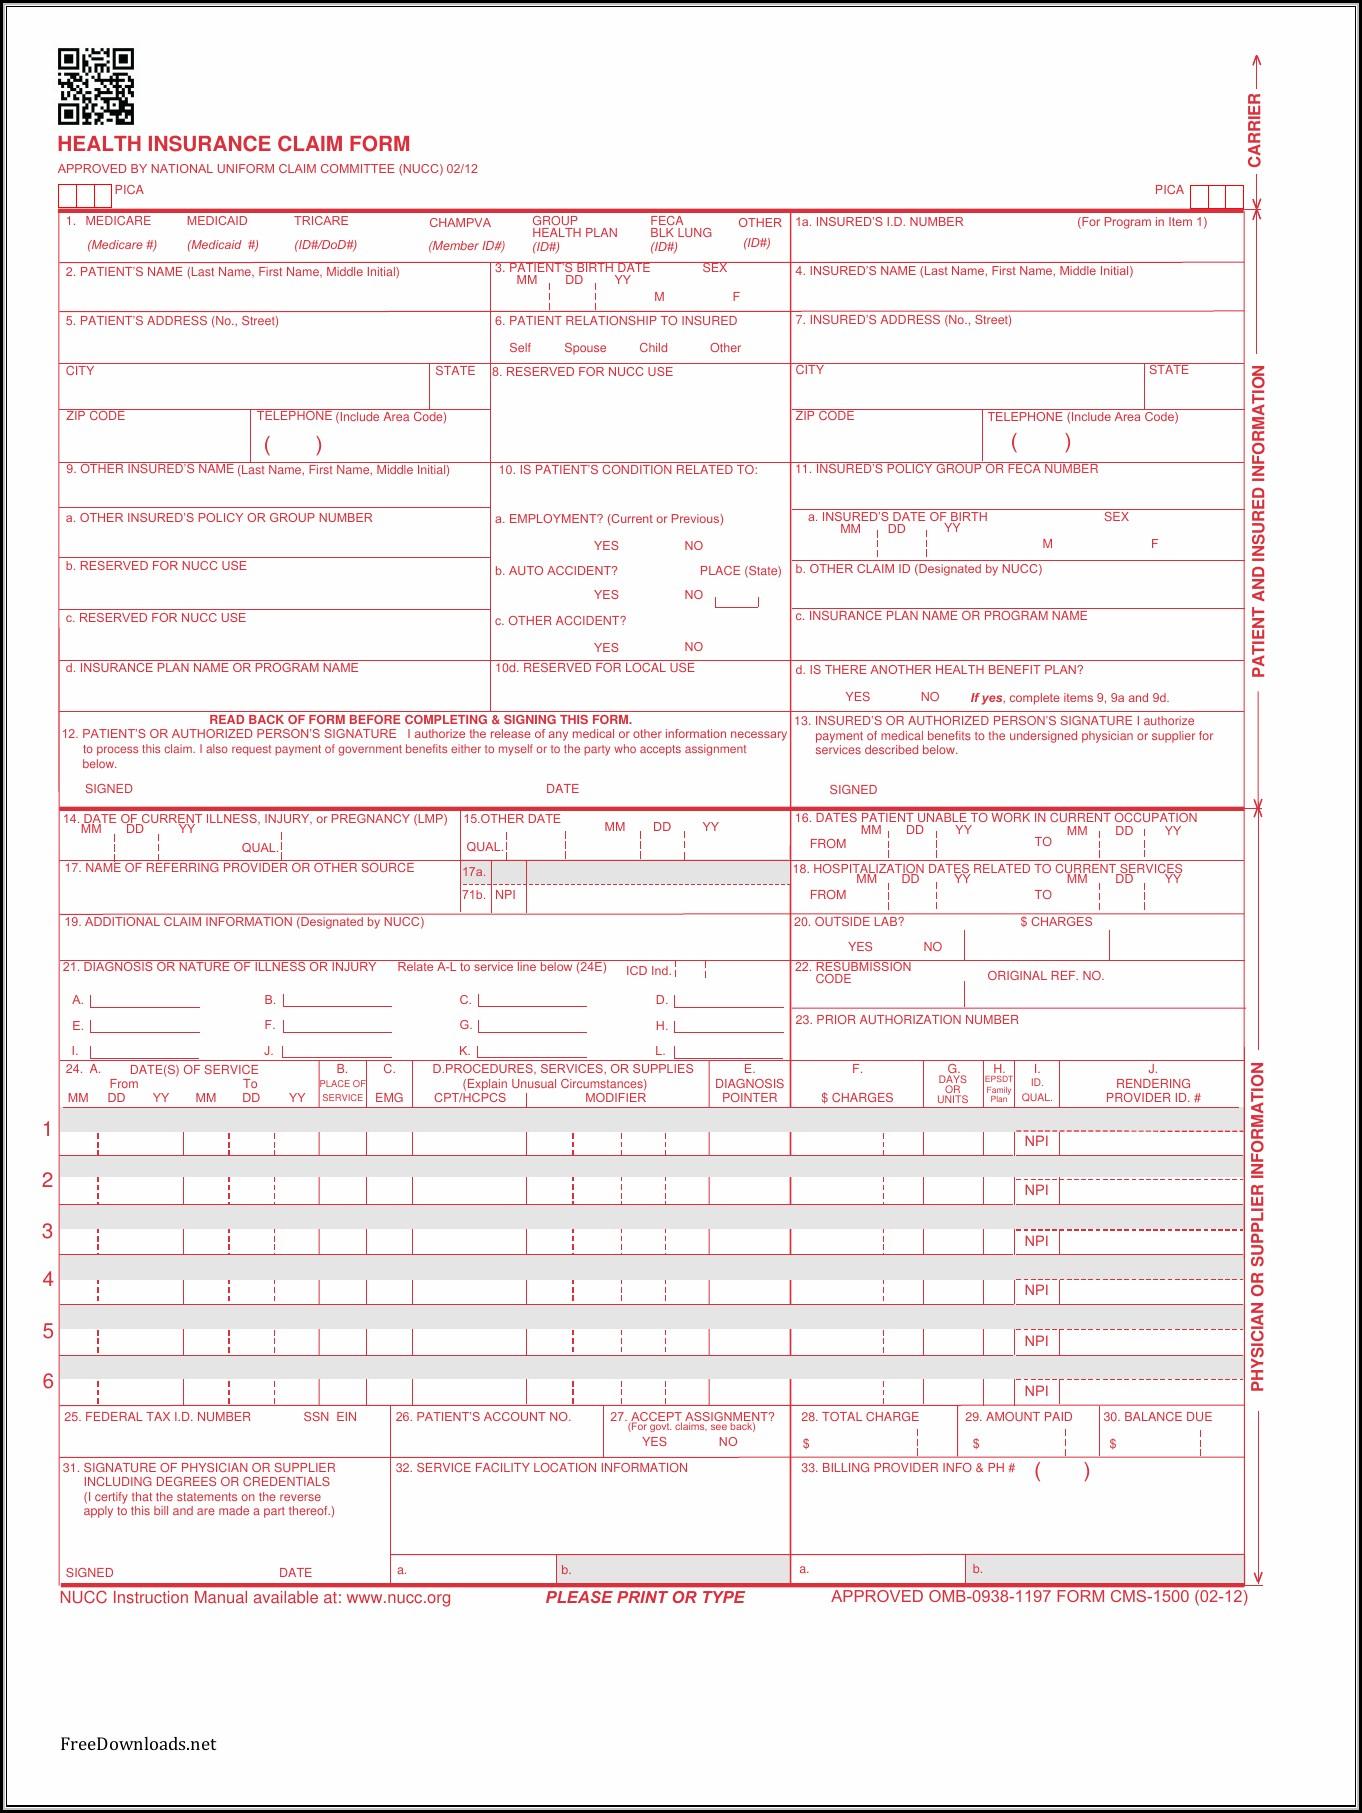 Cms 1500 Claim Form Pdf